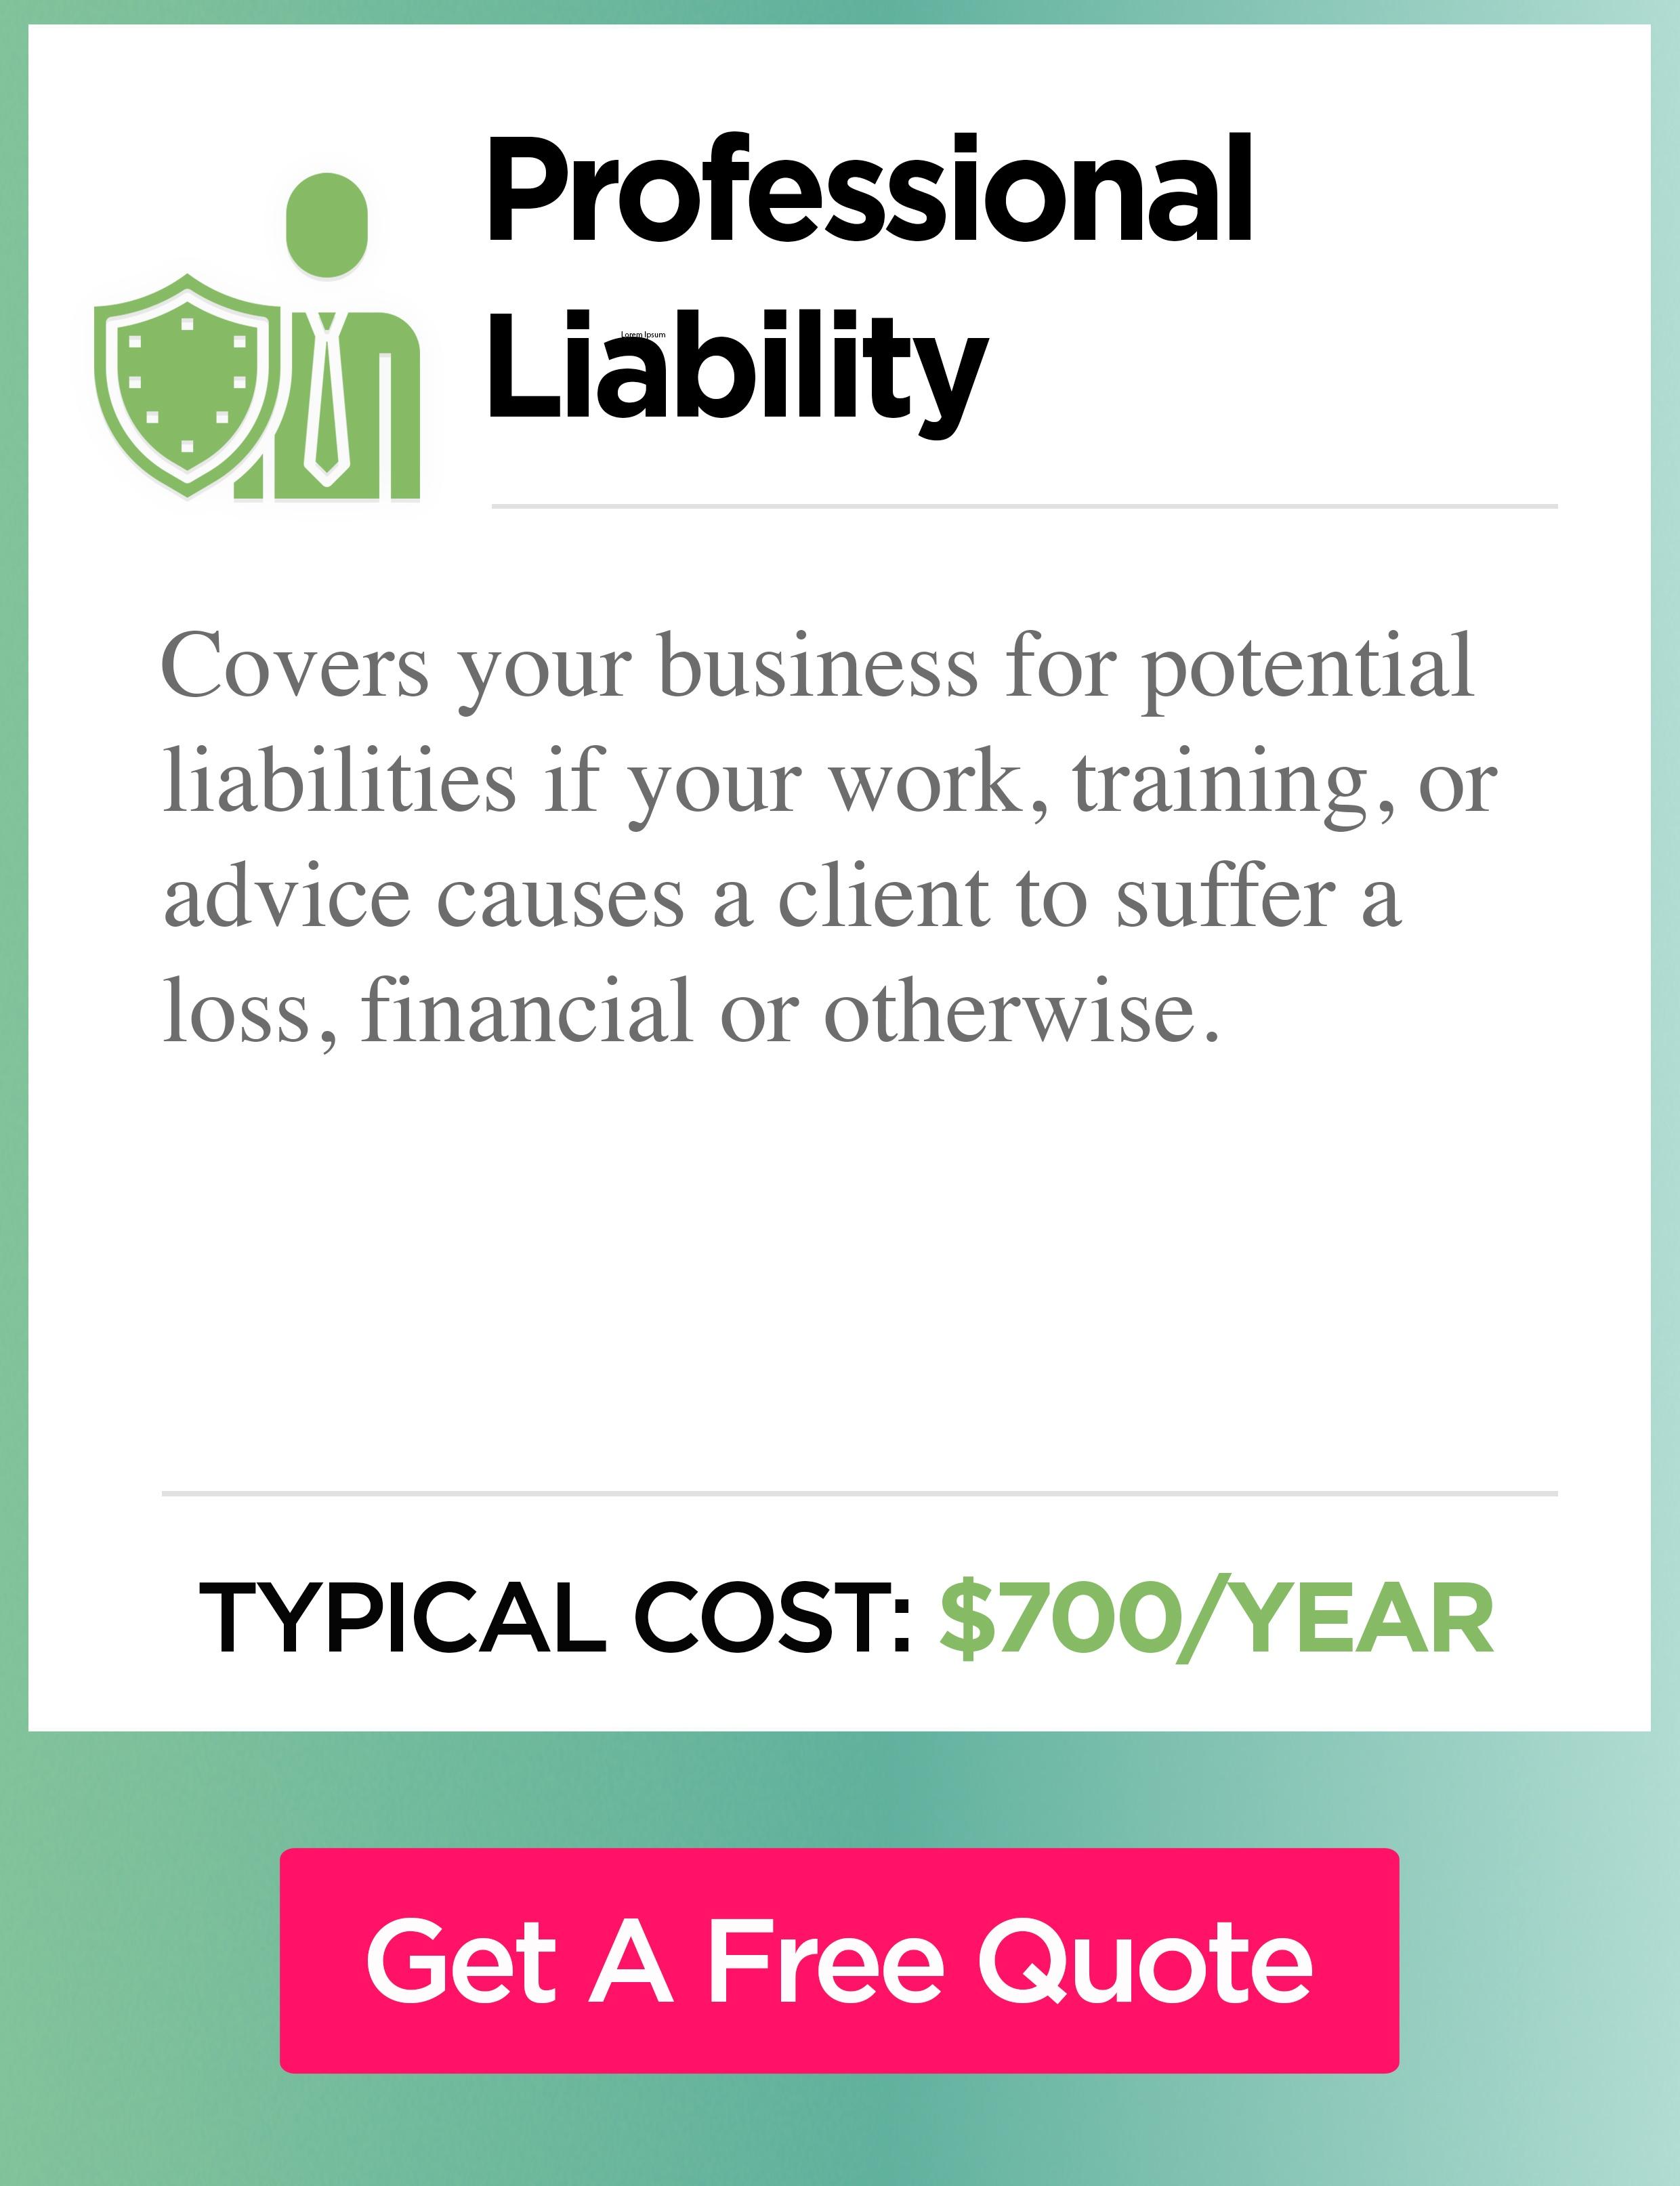 Professional liability